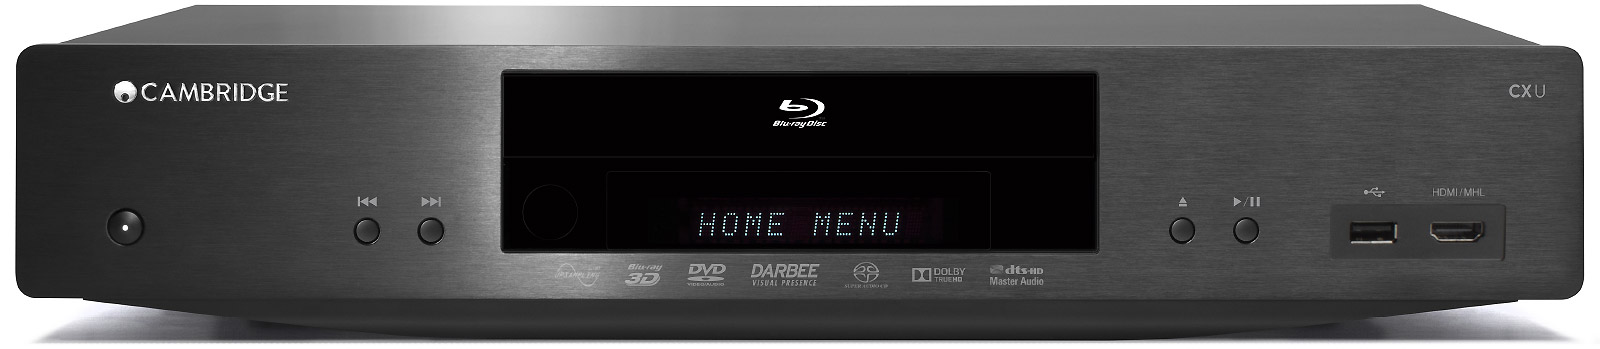 CXU - Universal Blu-Ray Player | Cambridge Audio